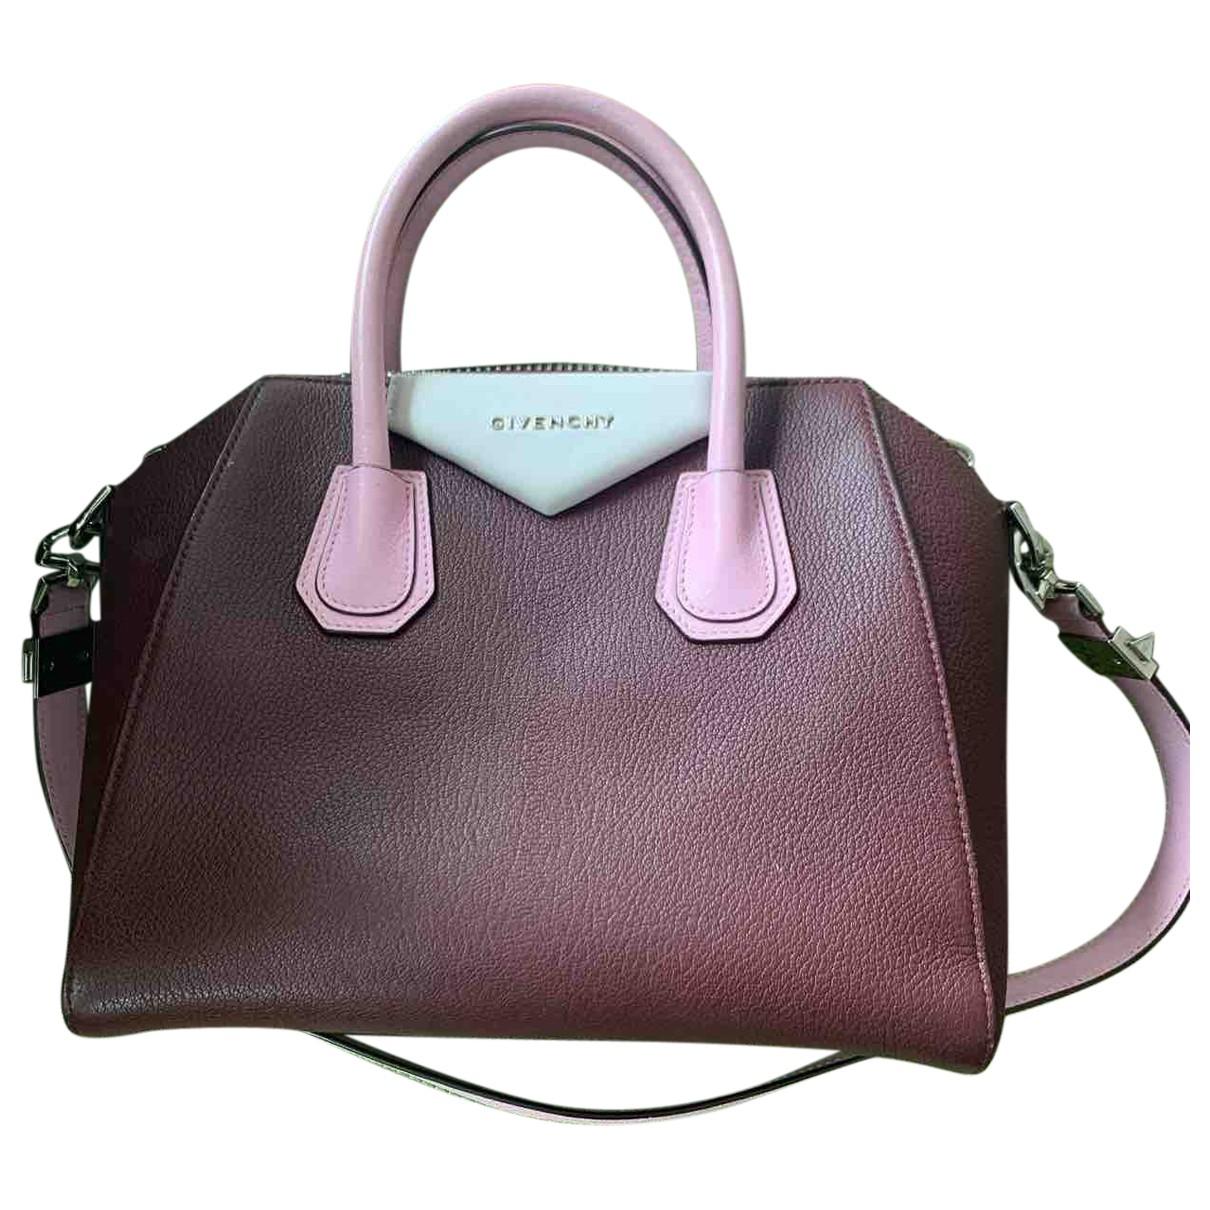 Givenchy - Sac a main Antigona pour femme en cuir - bordeaux